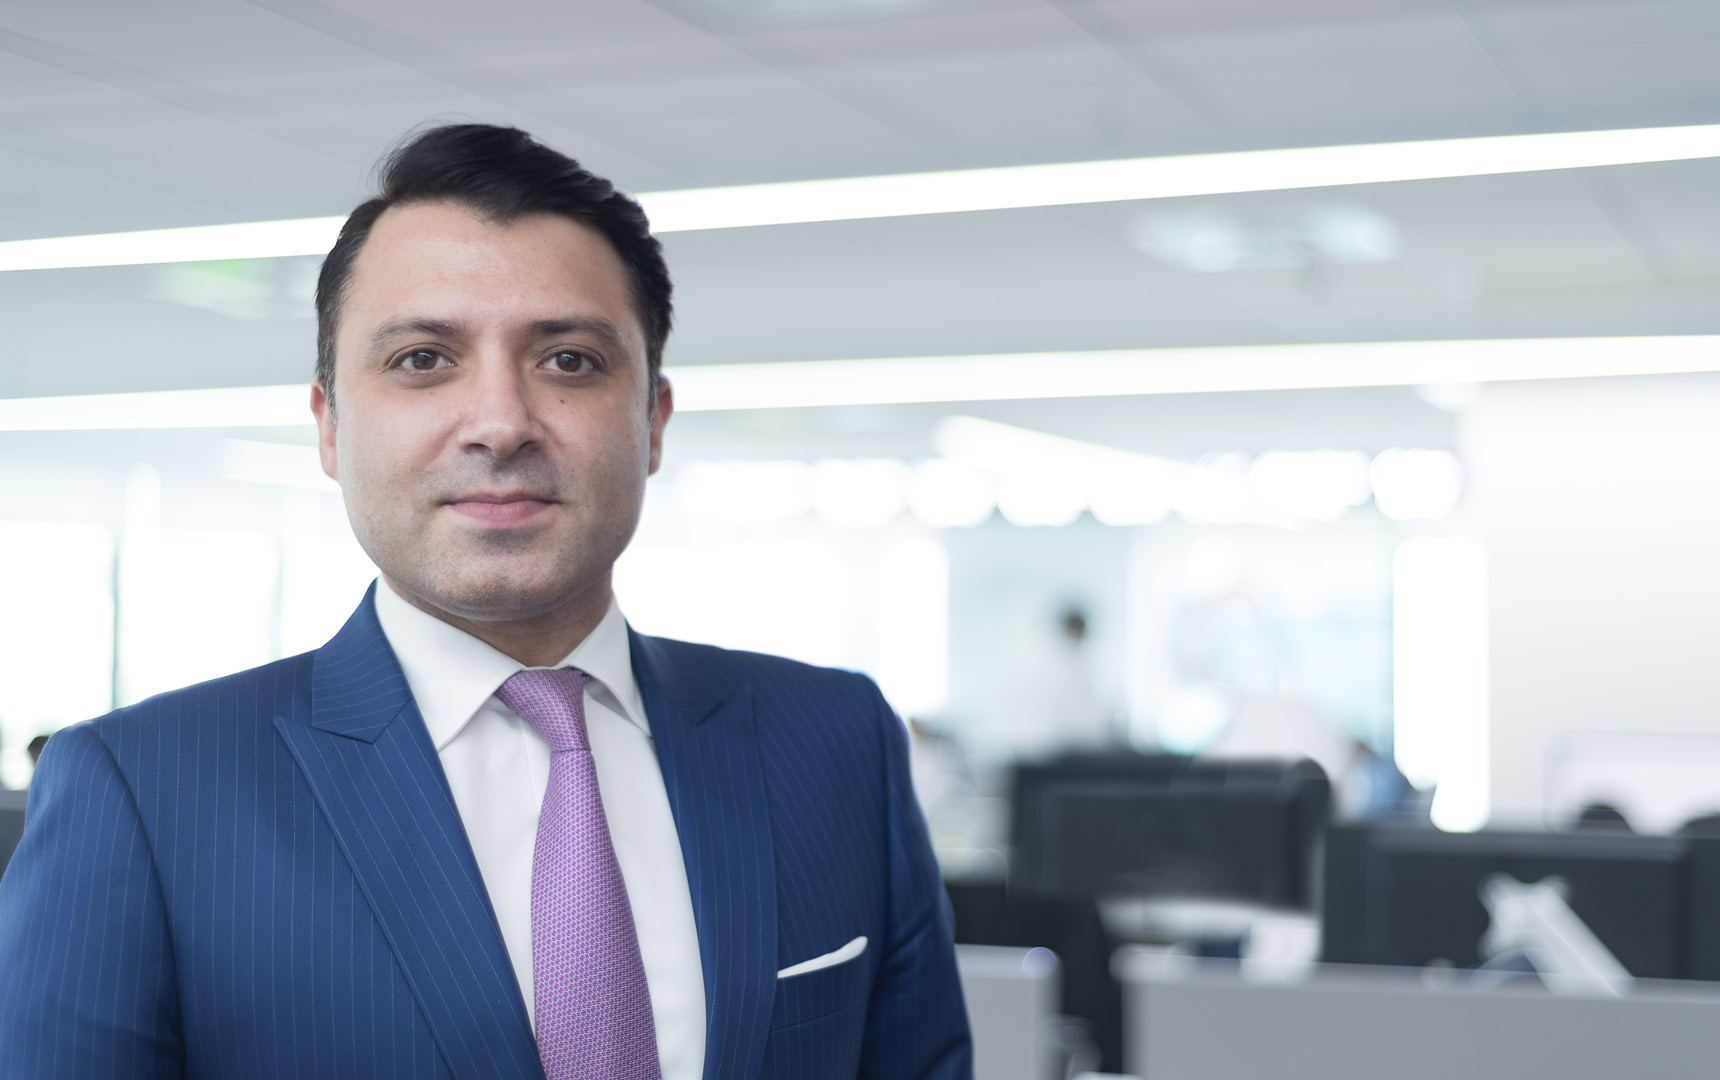 Puneet Gosain, Director and Head of India, Gerson Lehrman Group